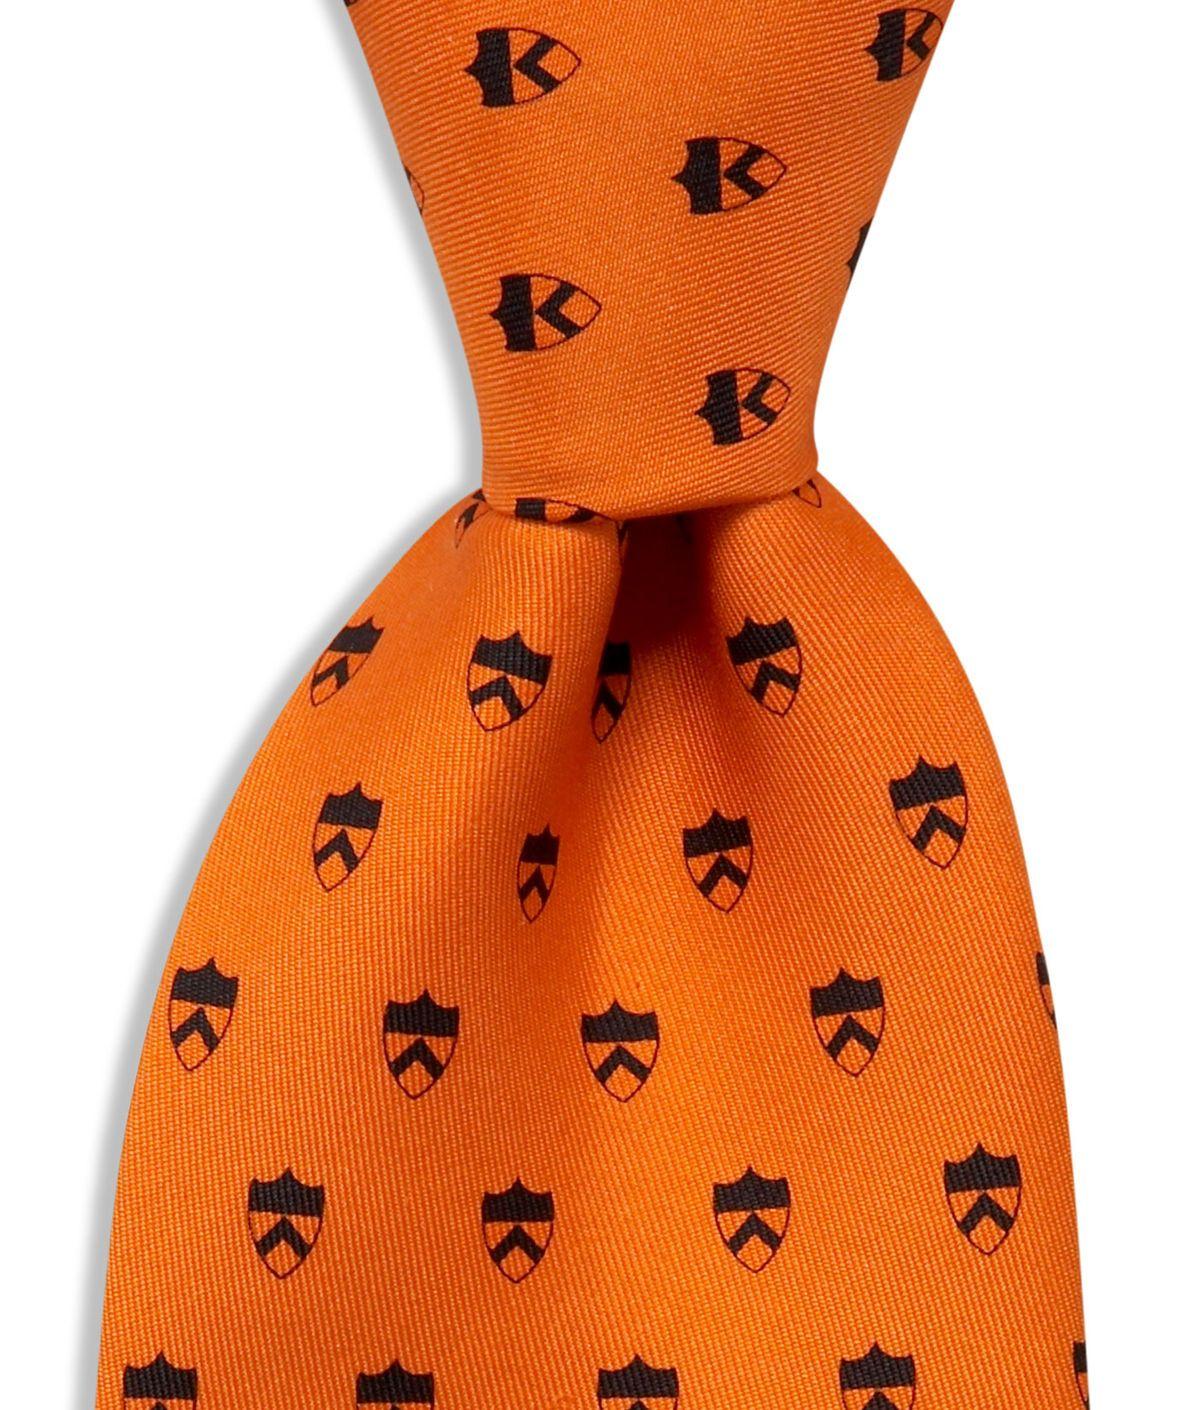 Princeton University Tie | gifts | Pinterest | Princeton ...